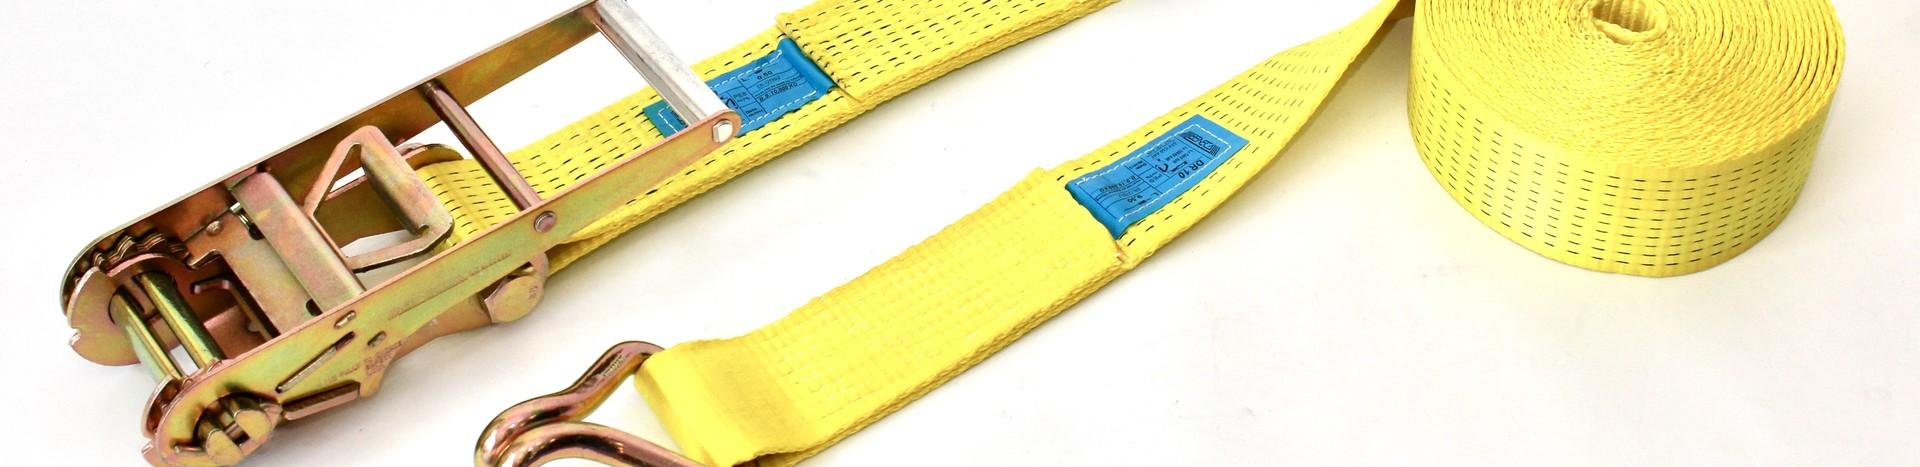 lashing straps 10 ton